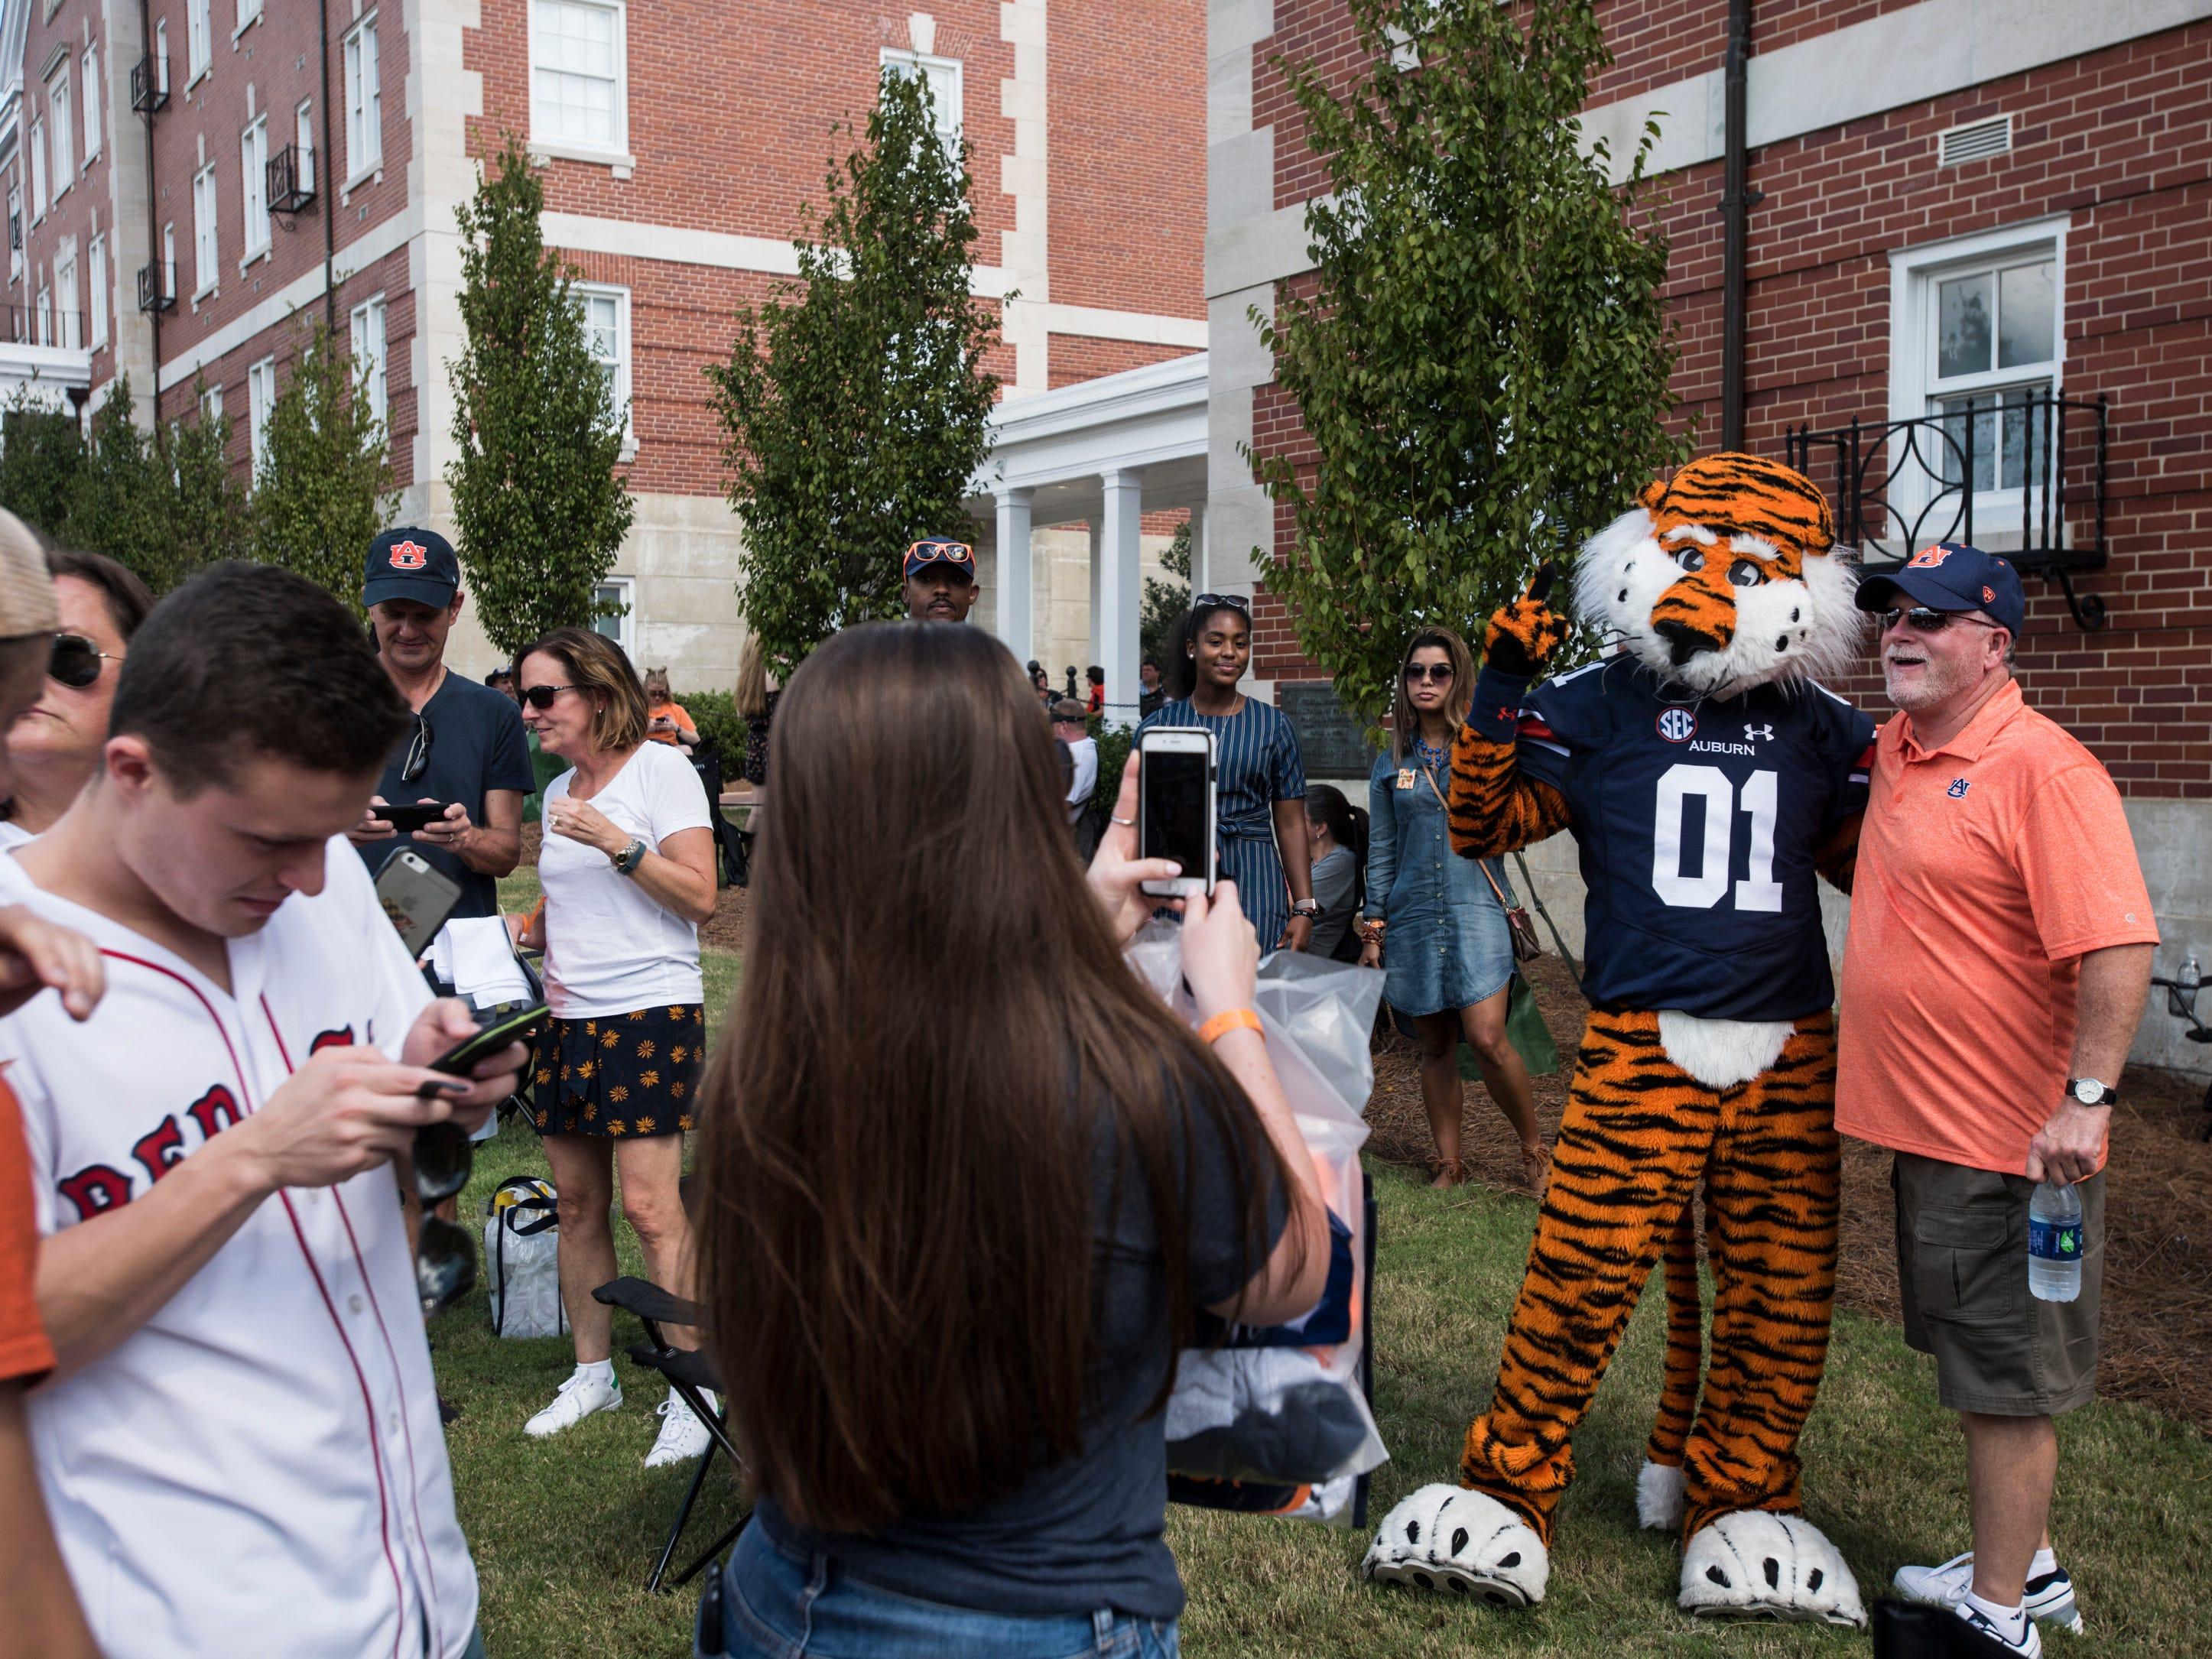 Fans take pictures with Auburn mascot, Aubie, outside Jordan-Hare Stadium in Auburn, Ala., on Saturday, Sept. 29, 2018.